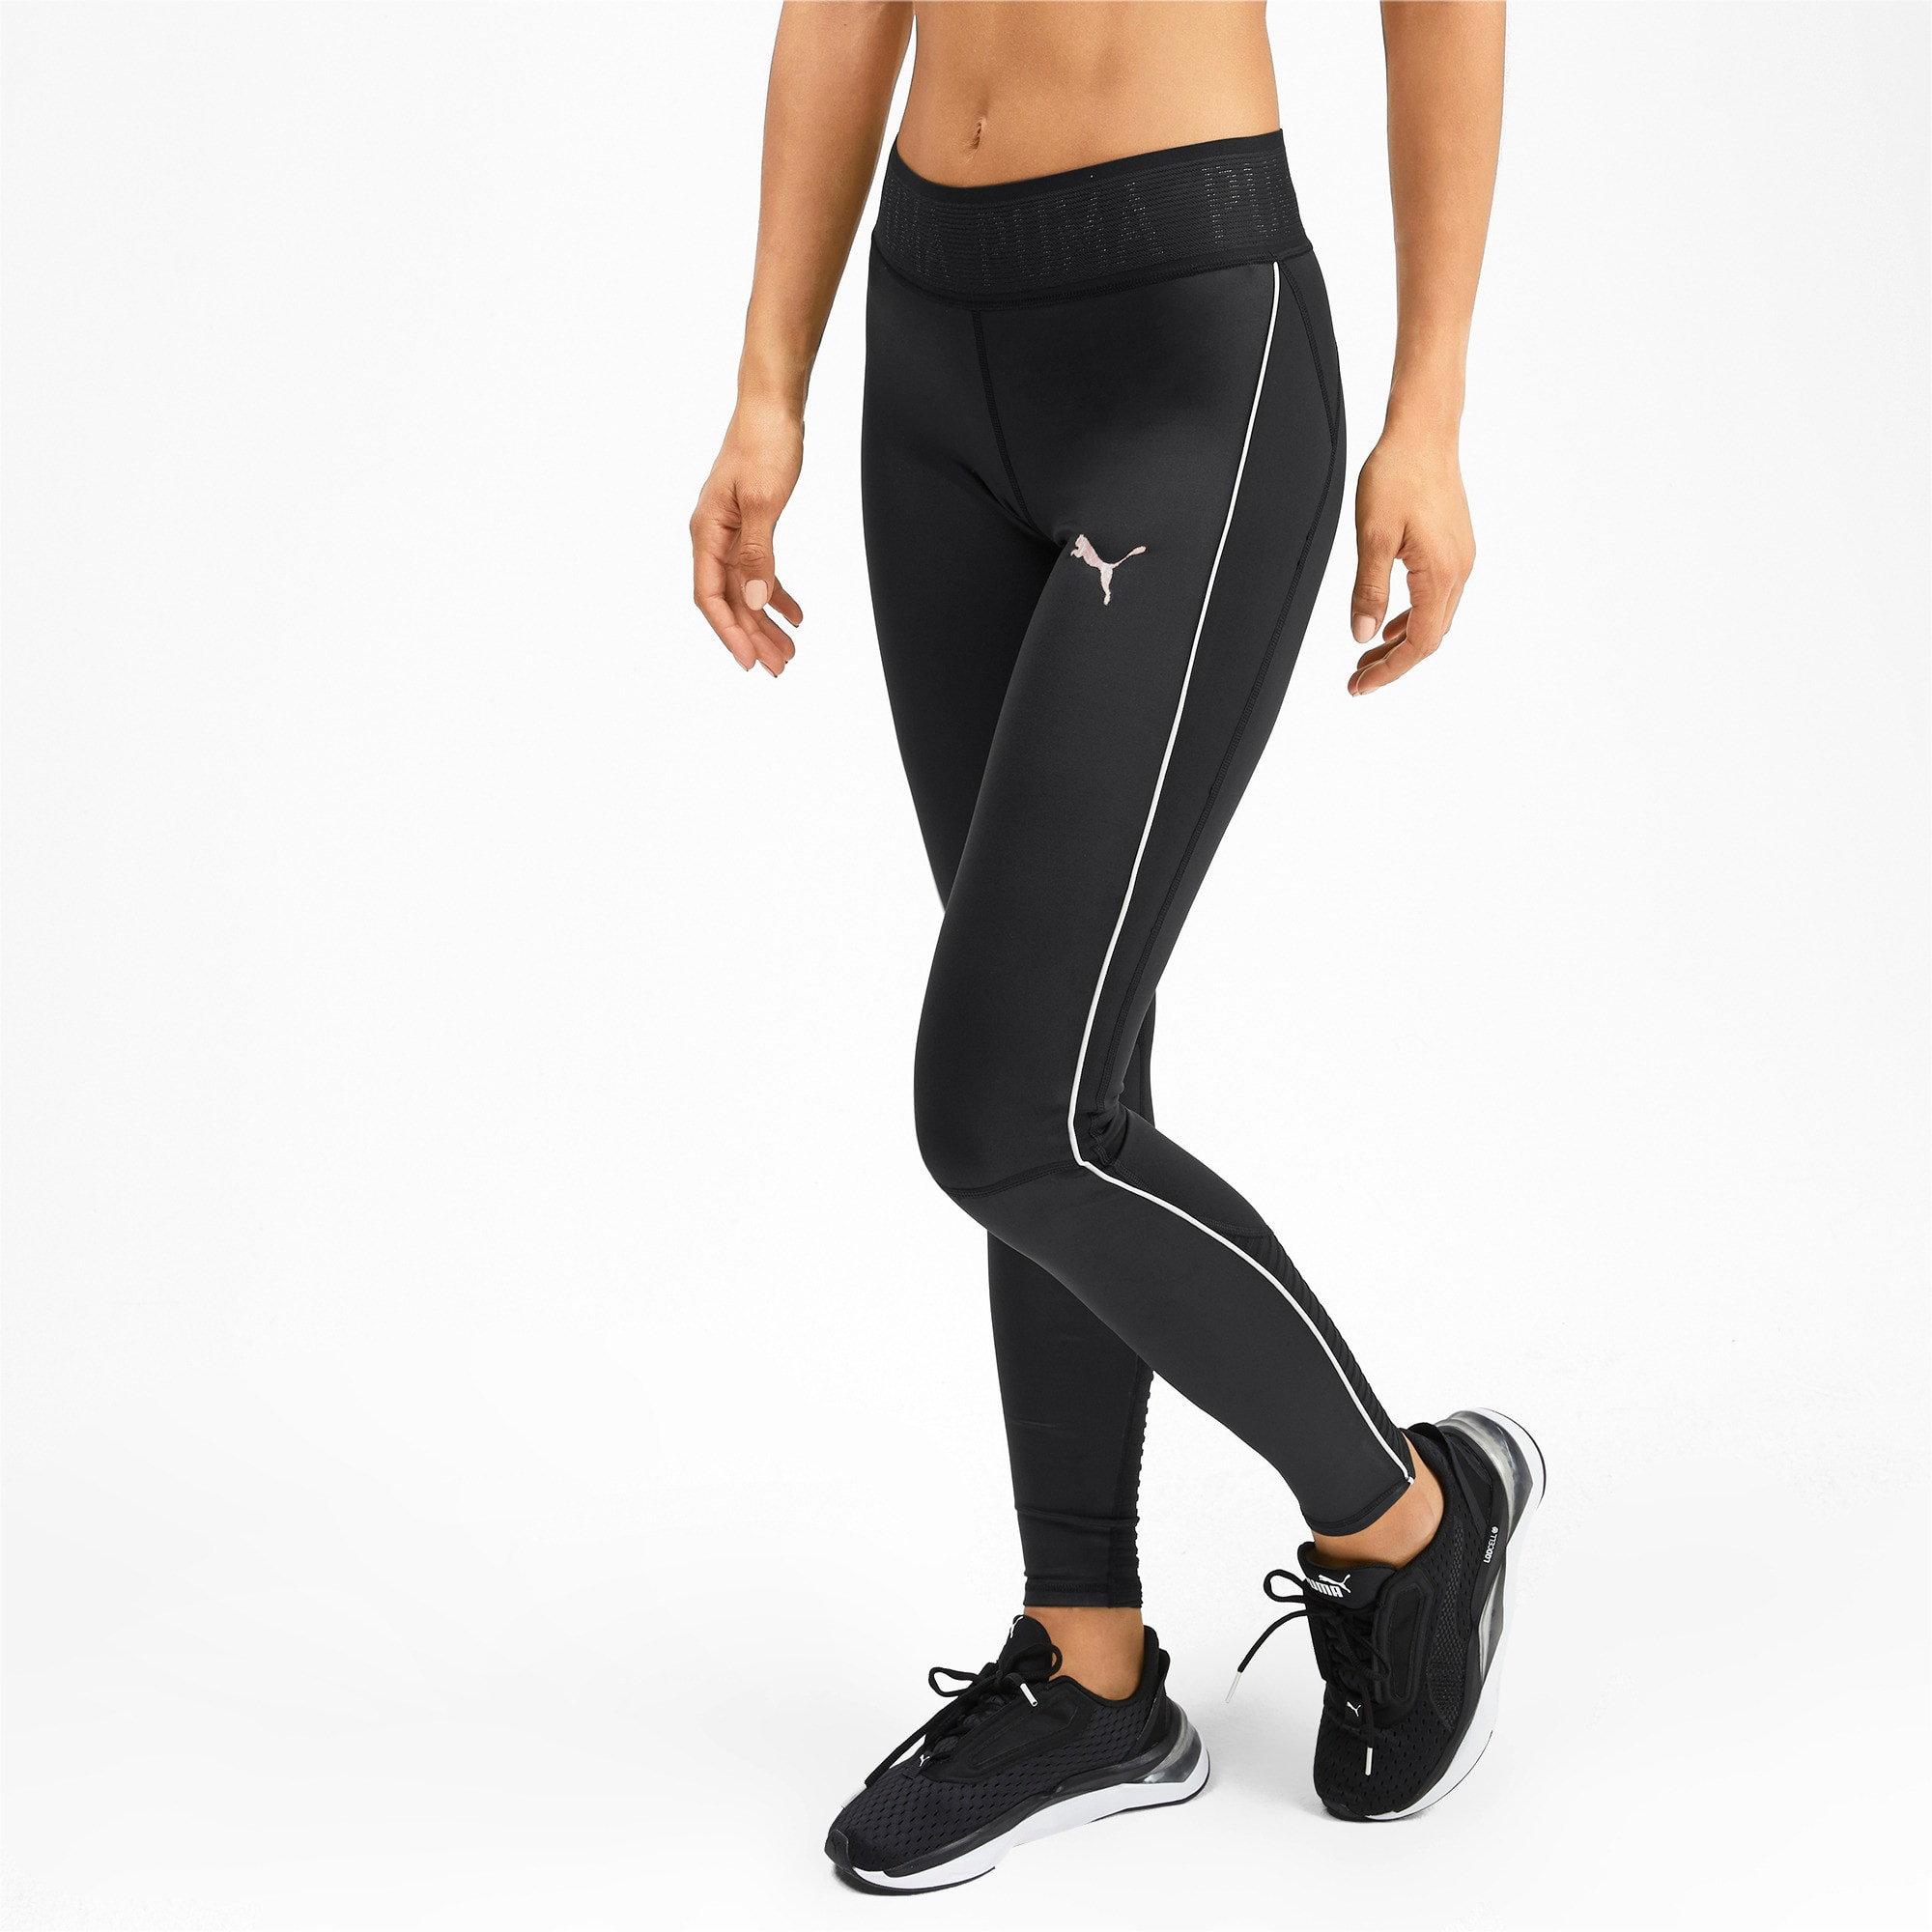 Thumbnail 1 of SHIFT Women's Training Leggings, Puma Black, medium